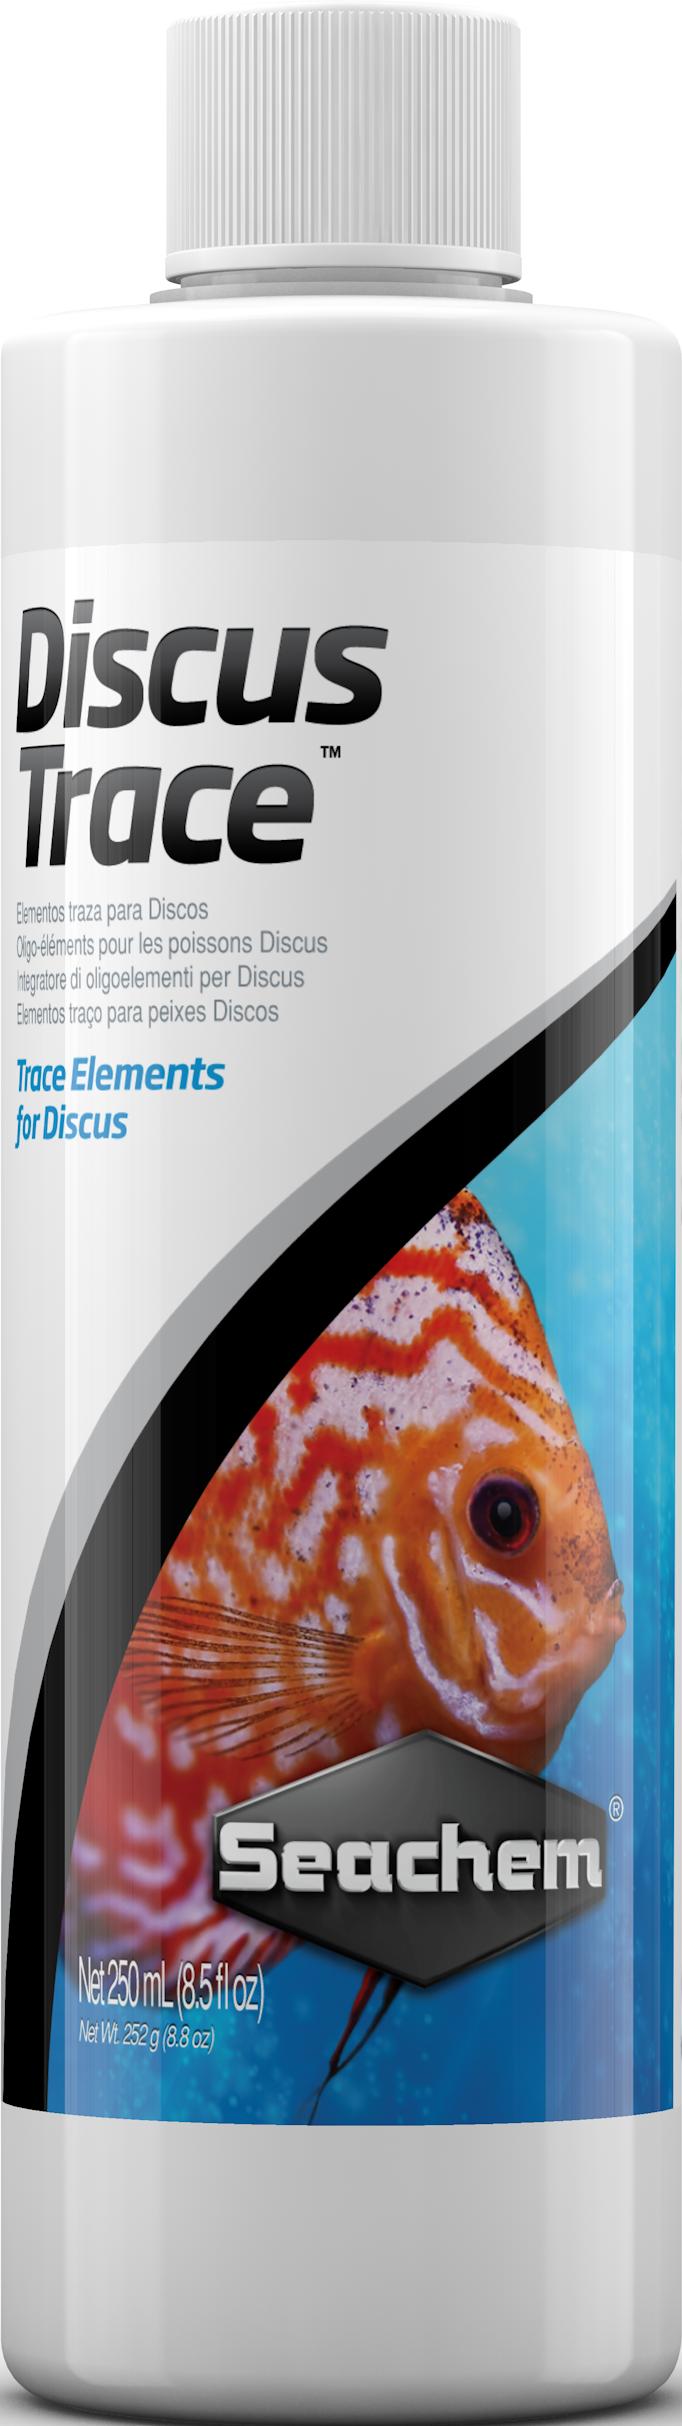 0756 Discus Trace 250 M L 1